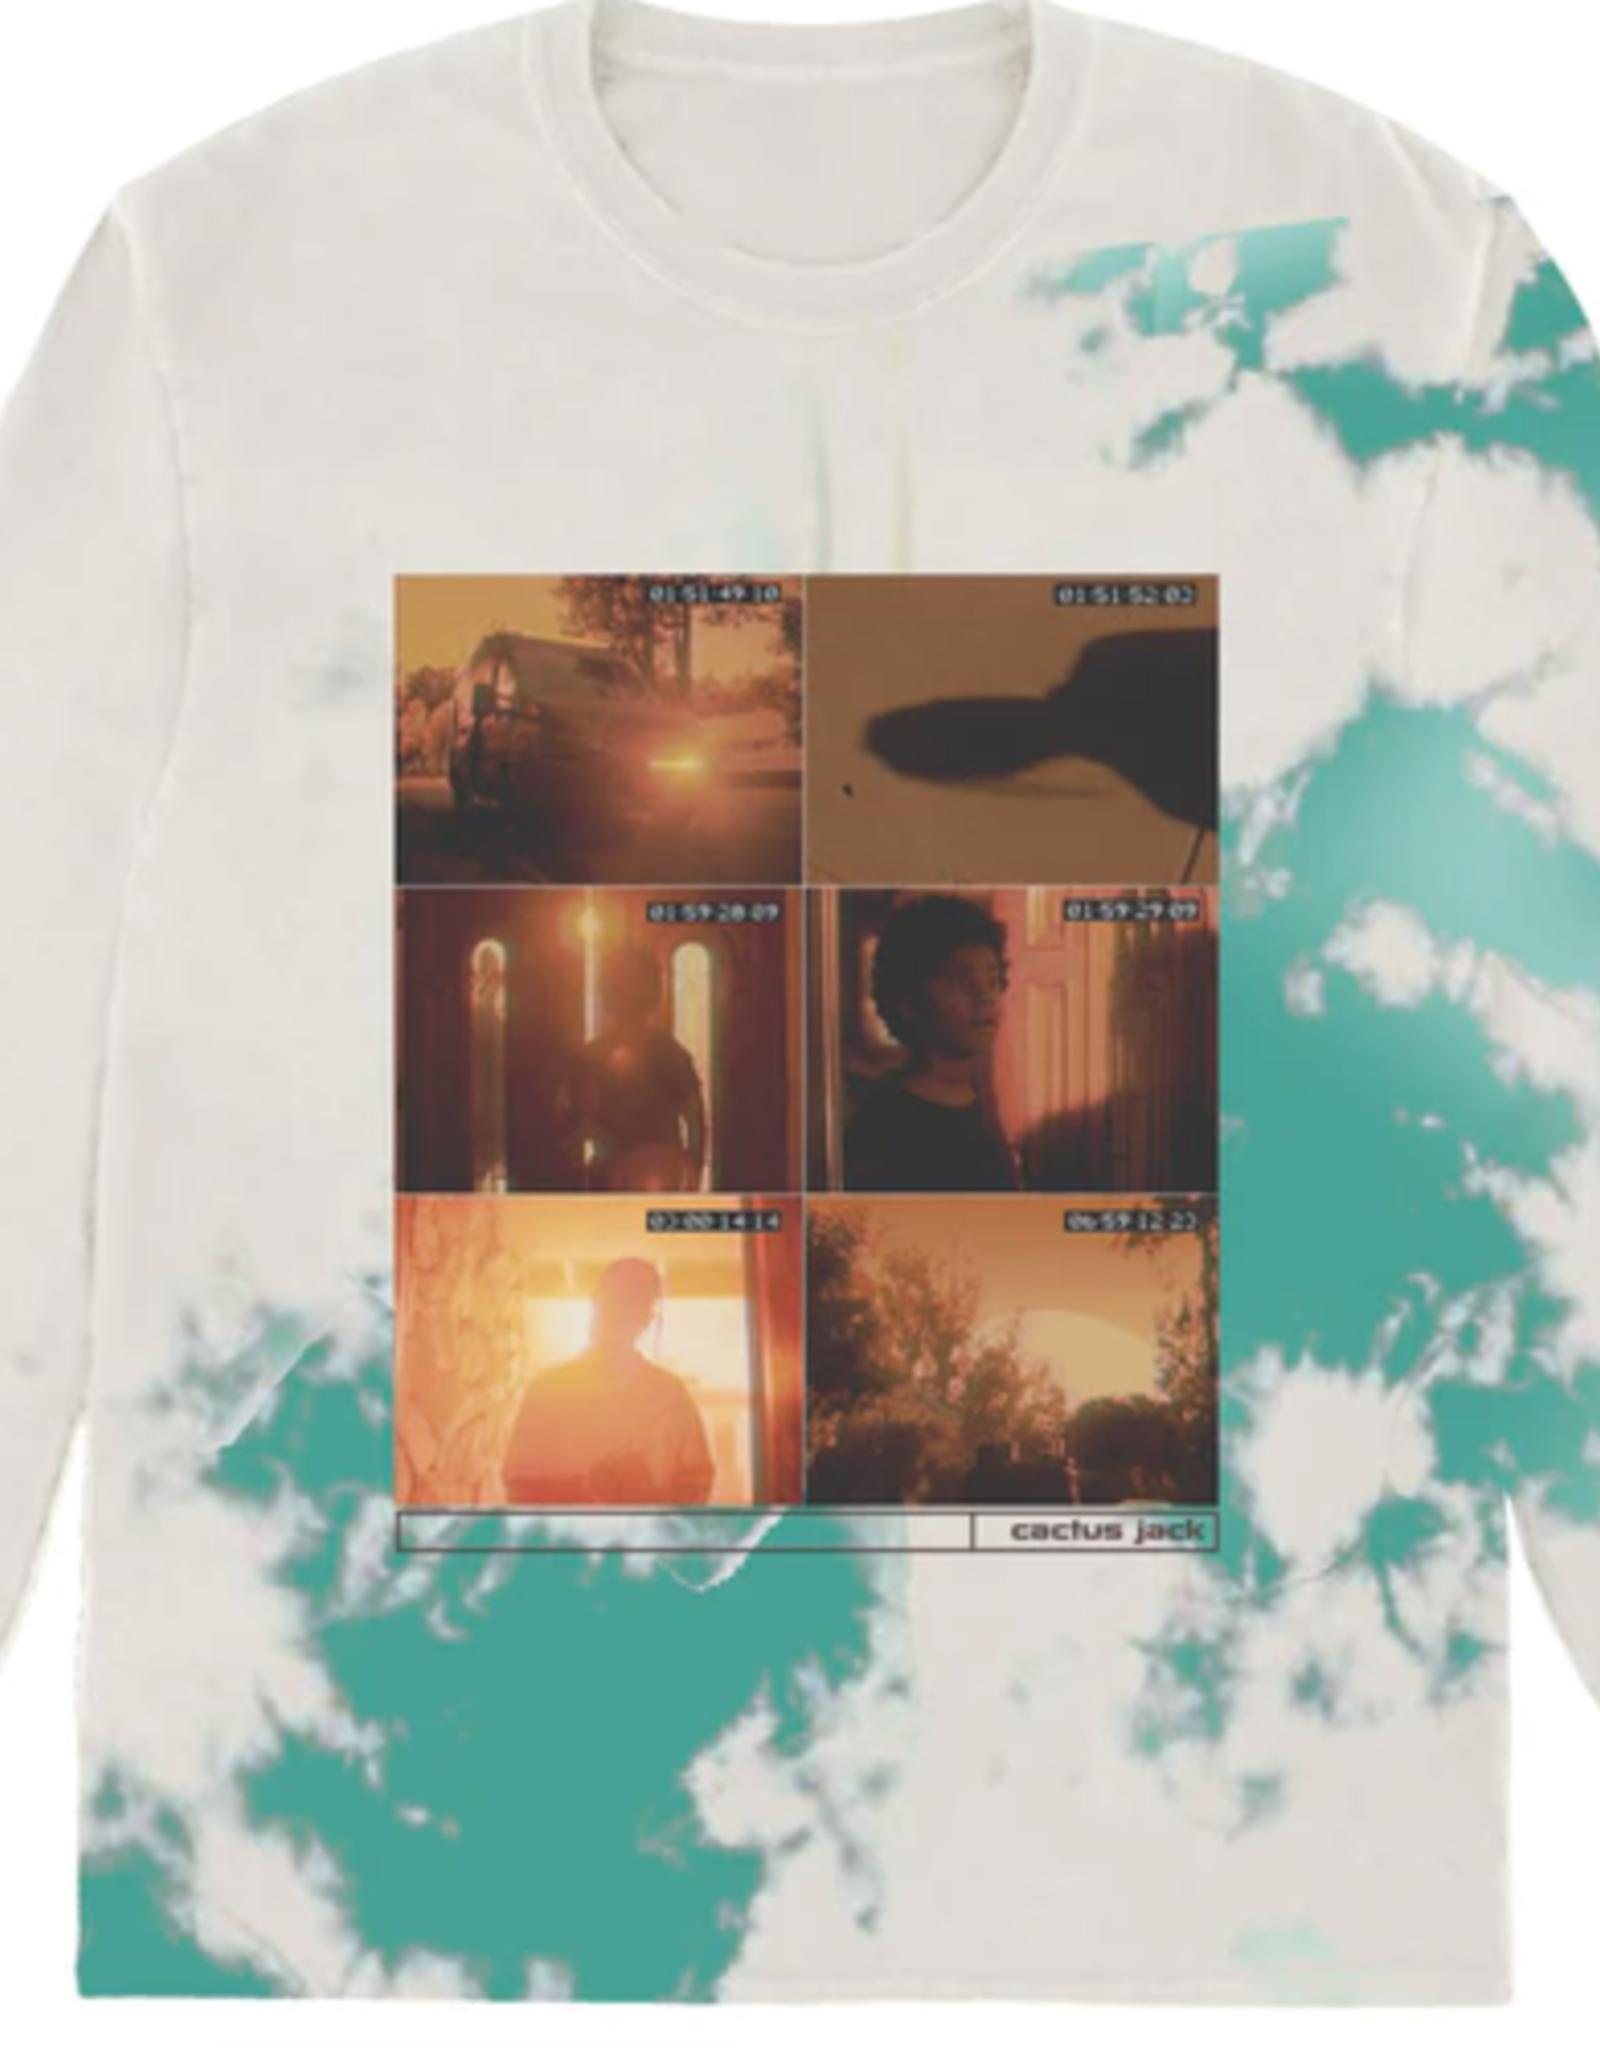 TRAVIS SCOTT Travis Scott Something's Coming II L/S T-Shirt Multi - Medium